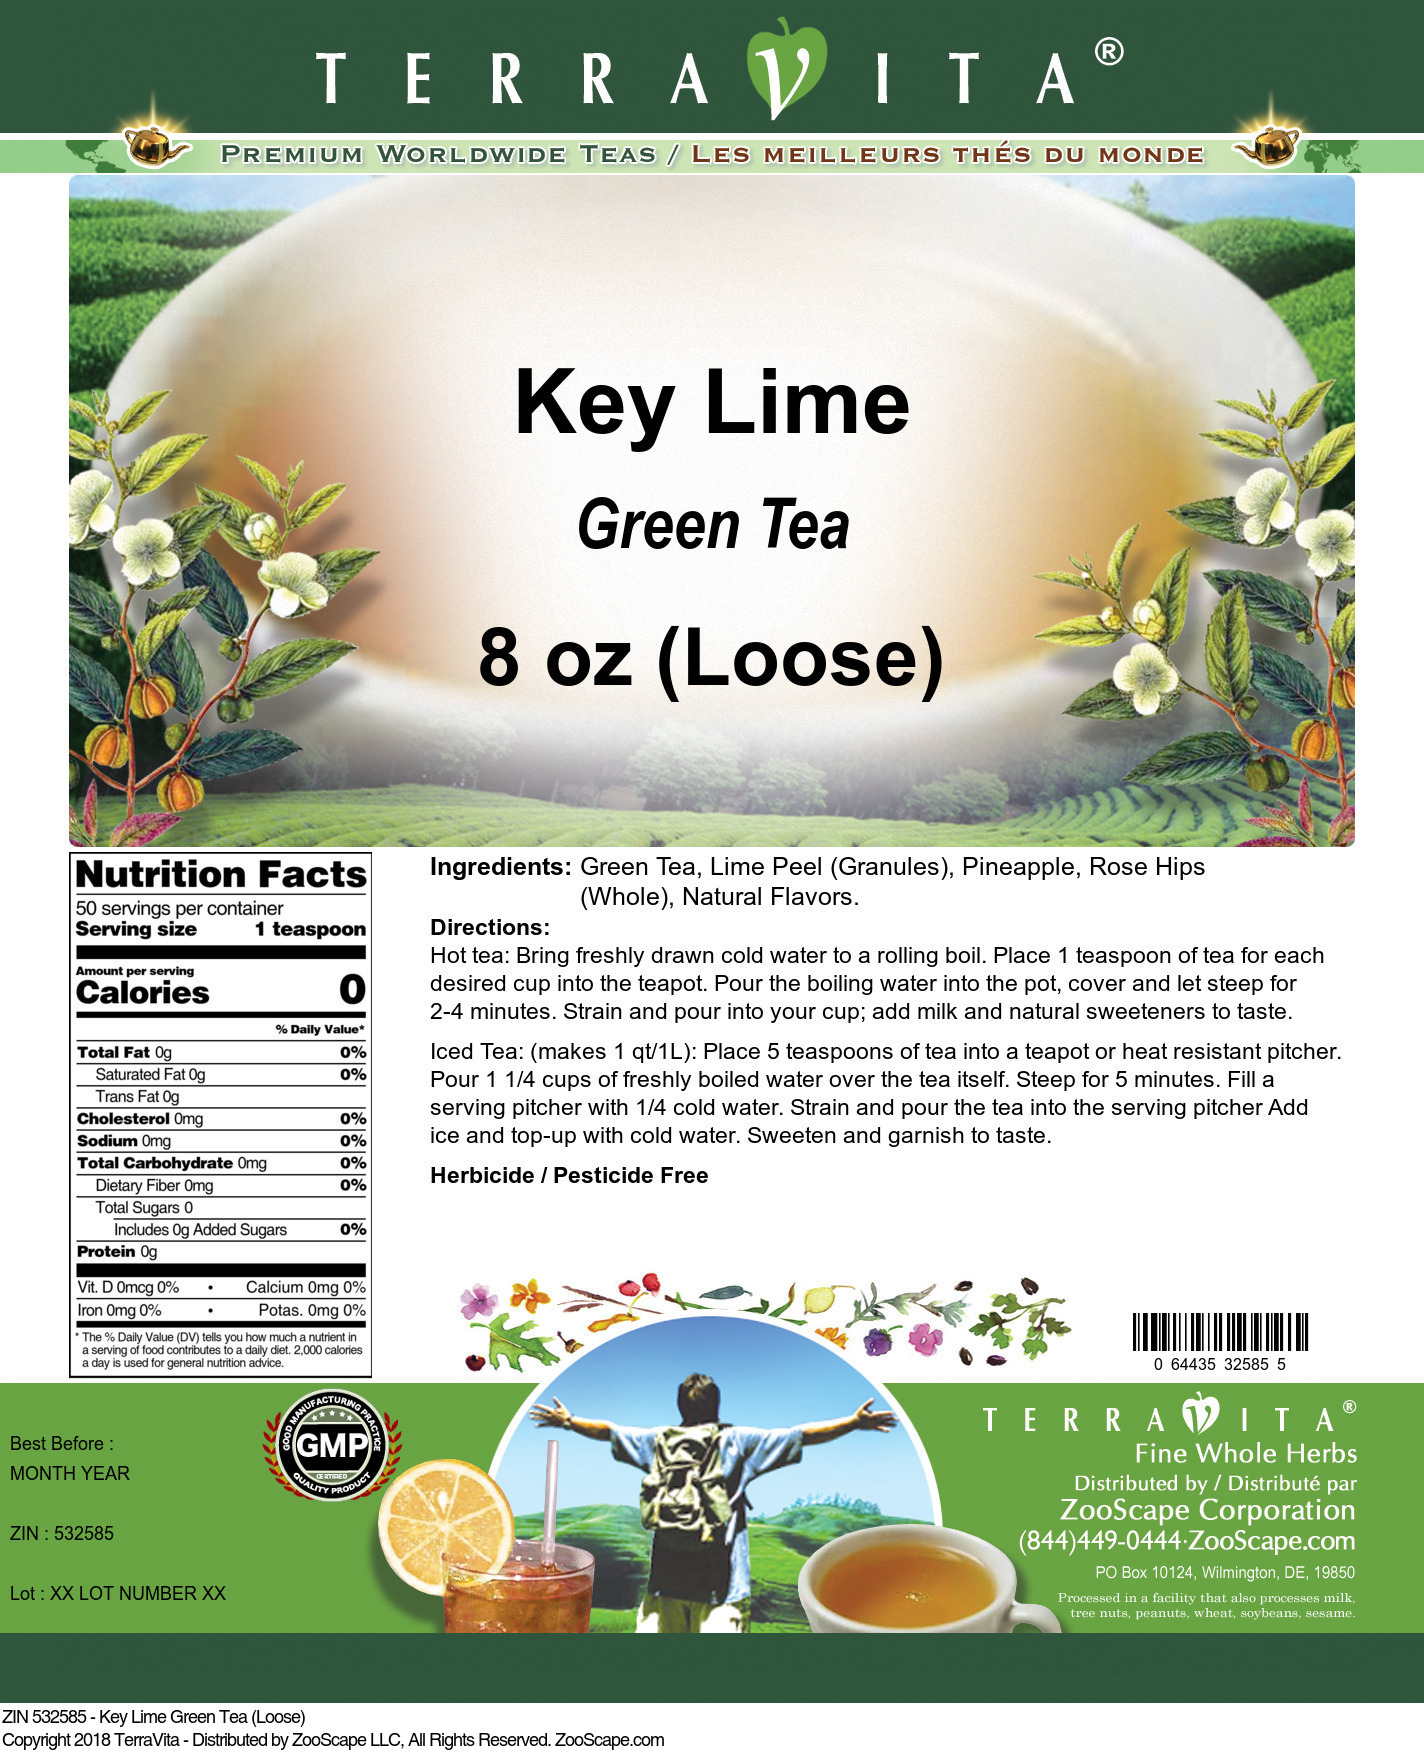 Key Lime Green Tea (Loose)